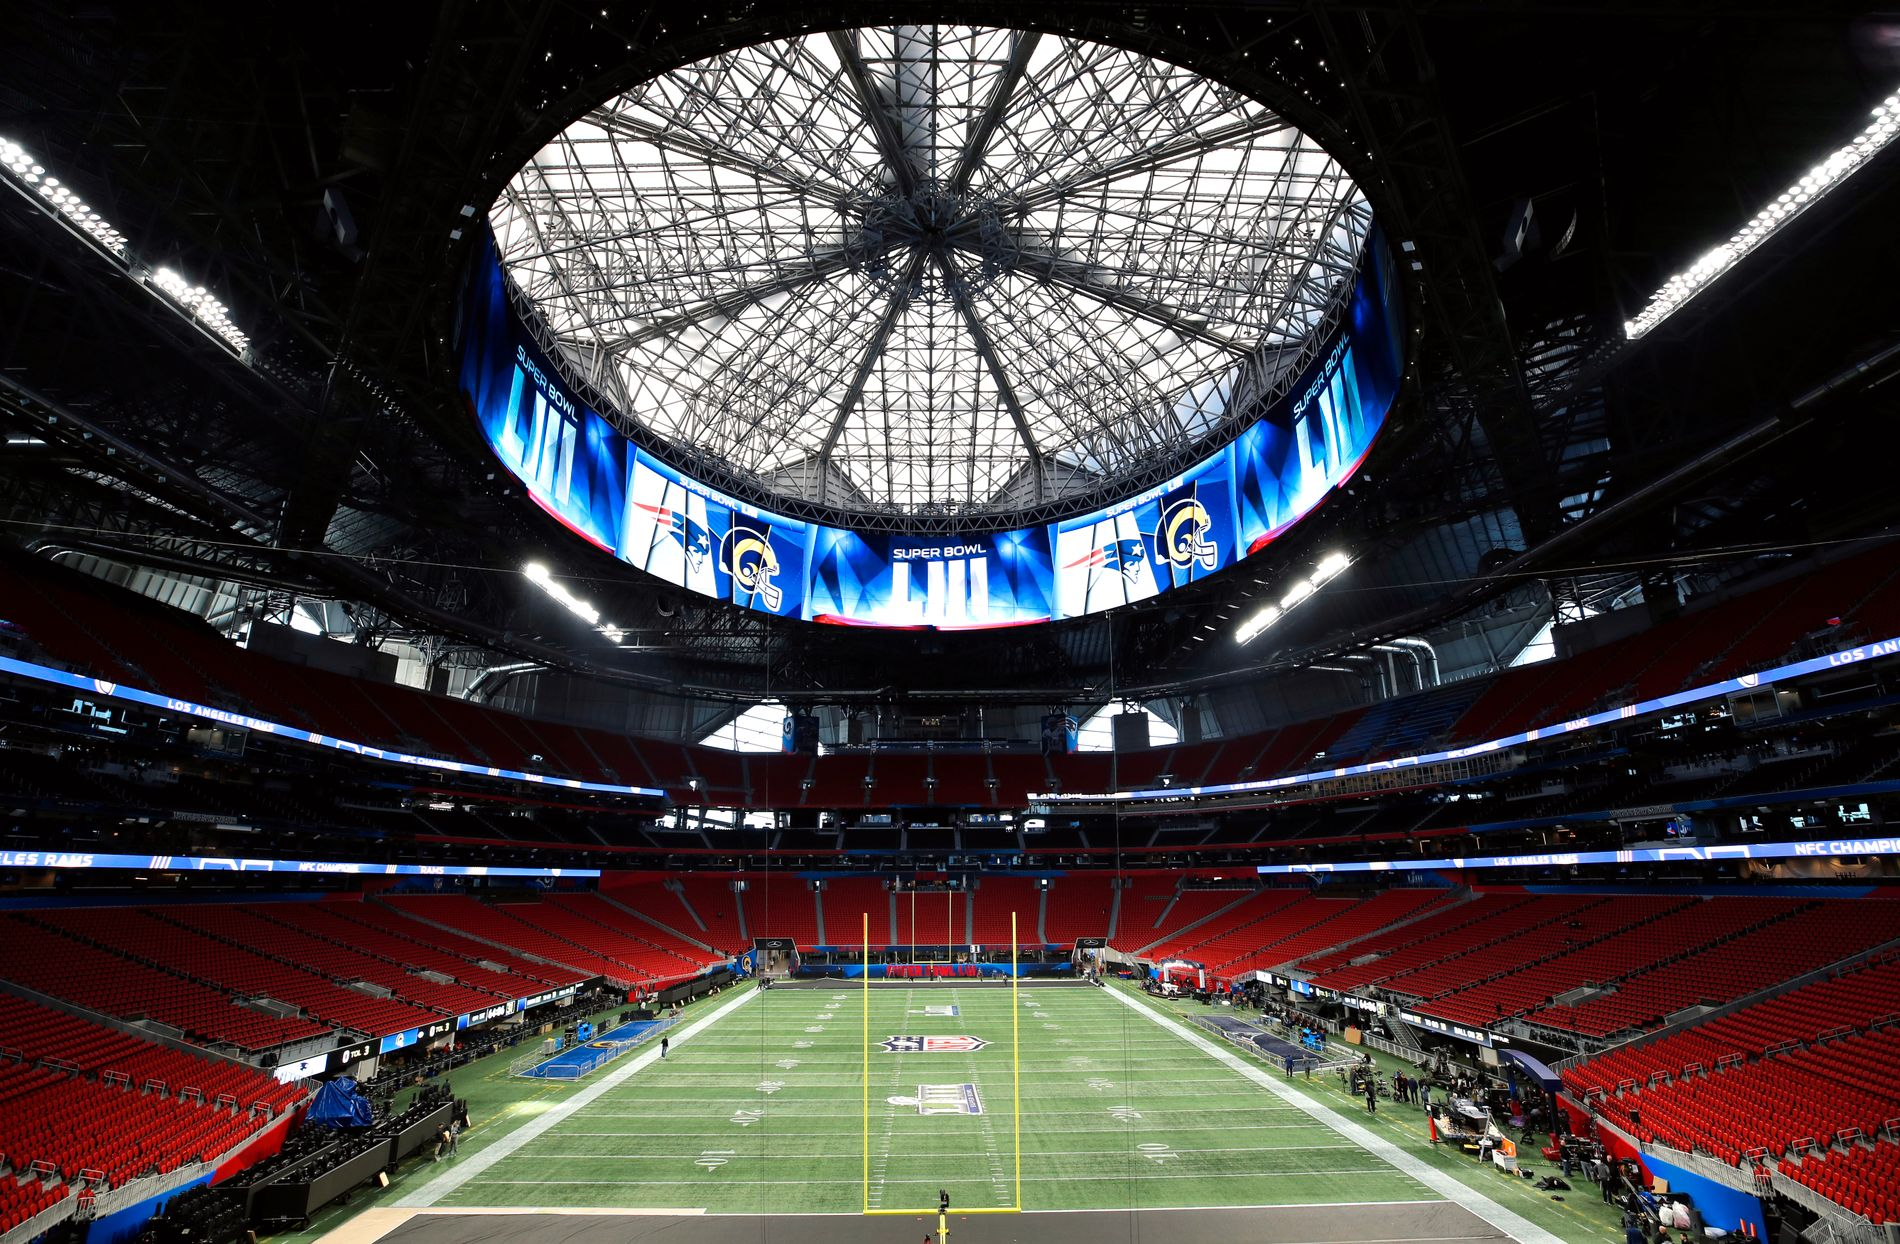 Årets Super Bowl spilles på Mercedes-Benz Stadium i Atlanta, med plass til over 70.000 tilskuere.